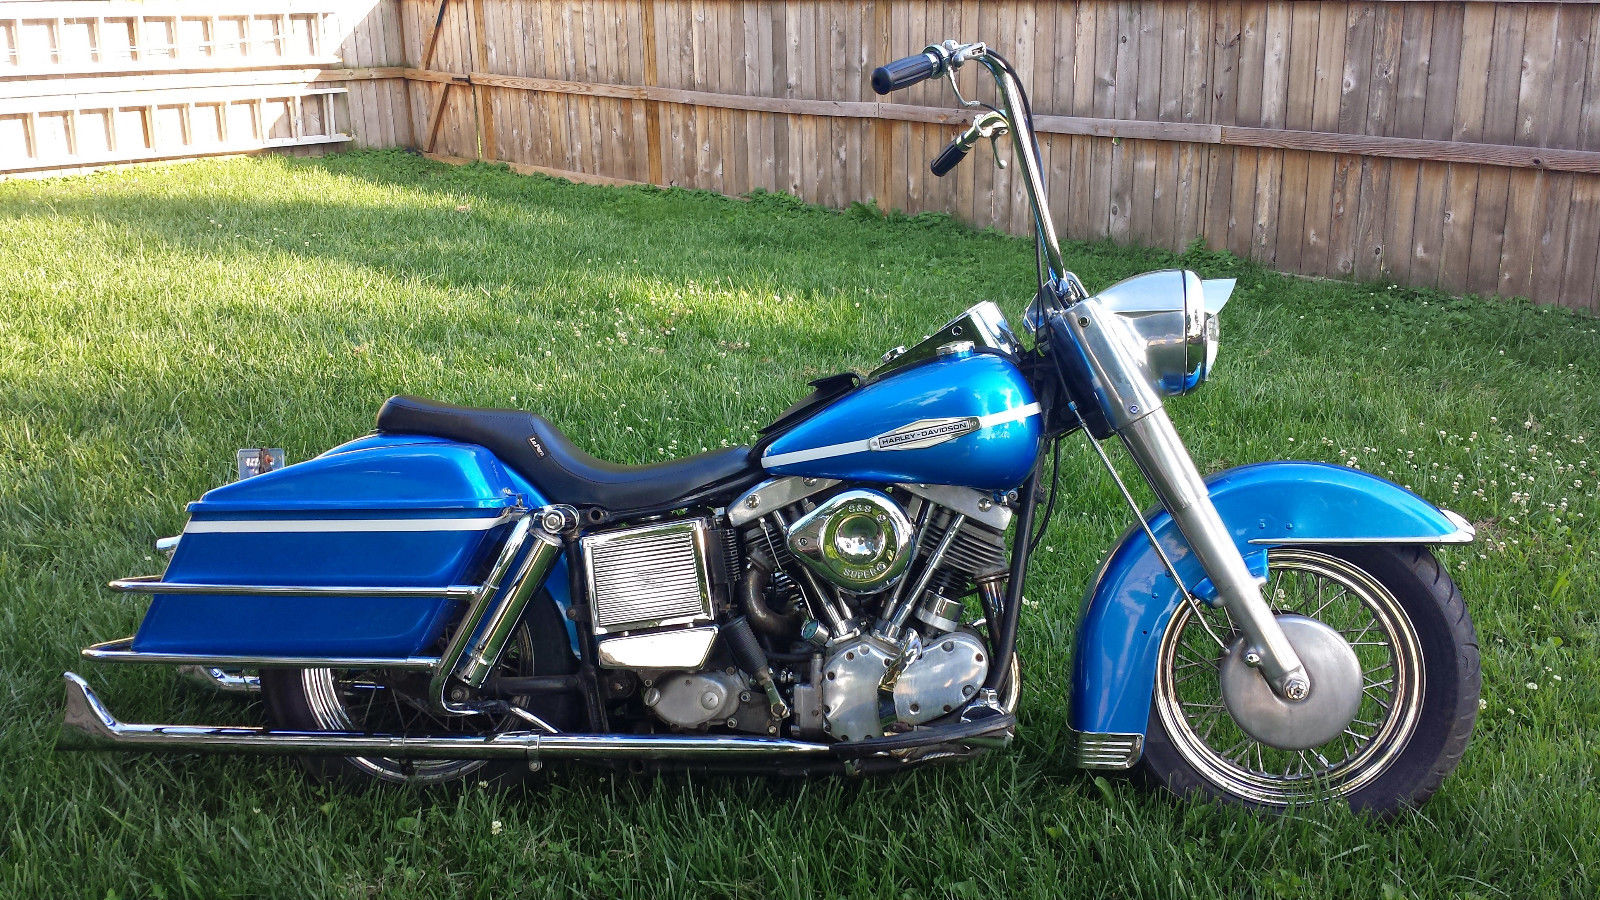 1969 Harley Davidson Pan Shovel 1200 Shovelhead Generator Police Wiring Harness